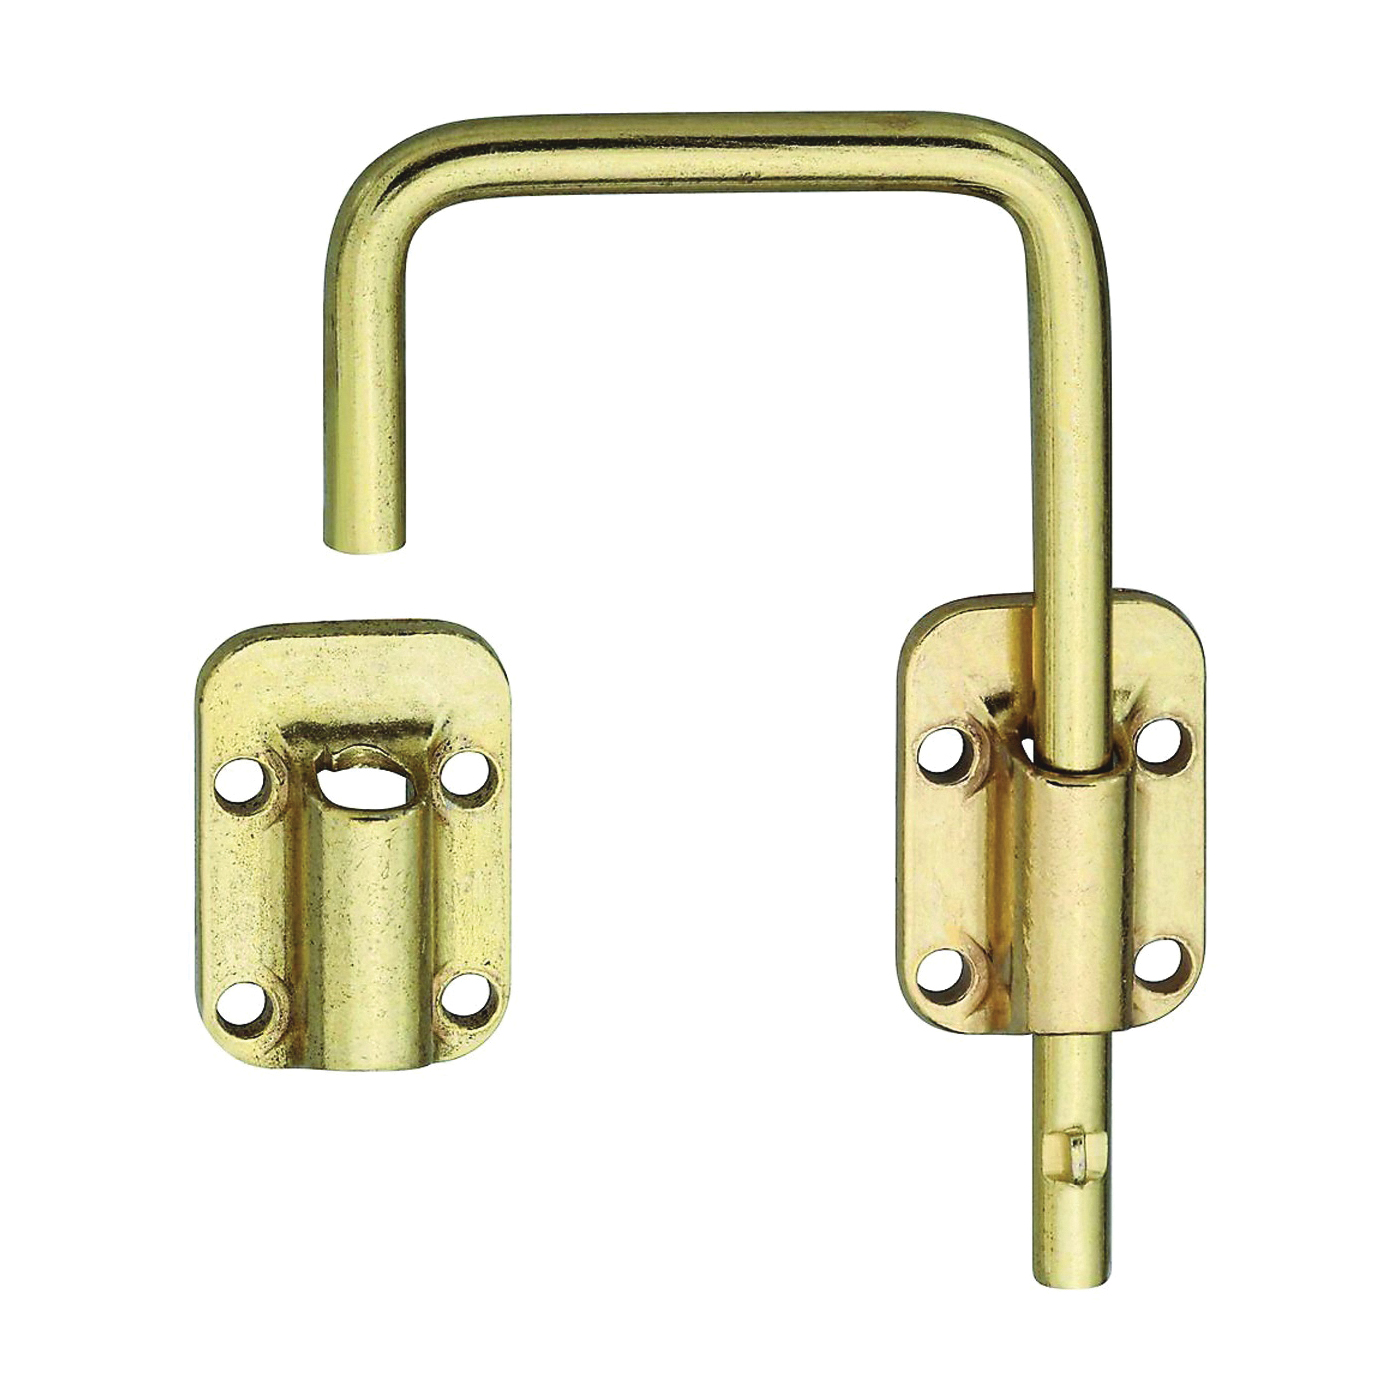 Picture of National Hardware N239-004 Sliding Door Latch, Steel, Brass